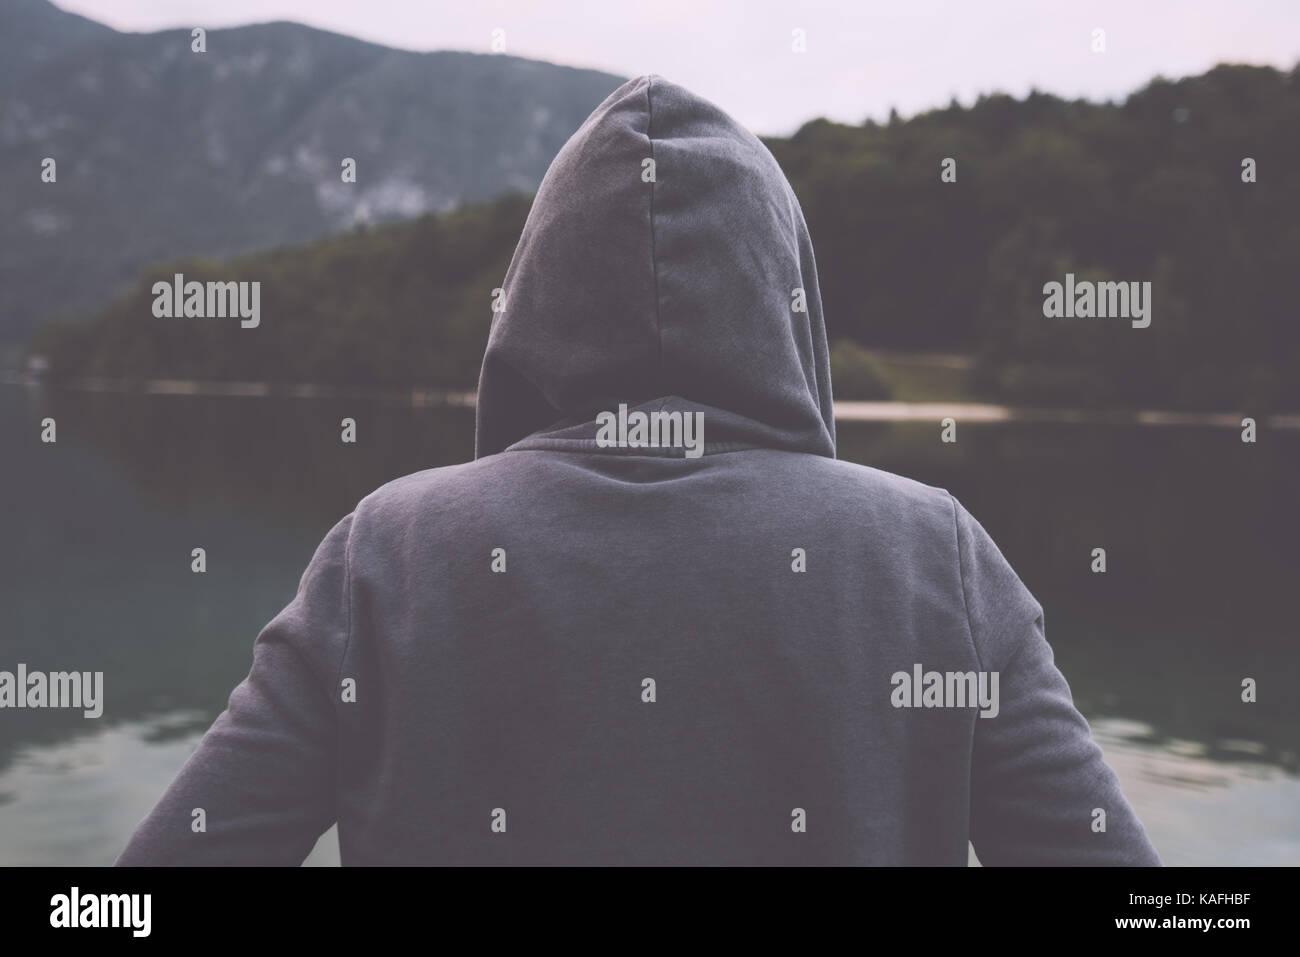 Gloomy nostalgic portrait of sad lonely melancholic adult female with hooded jacket standing on the lake shore in - Stock Image